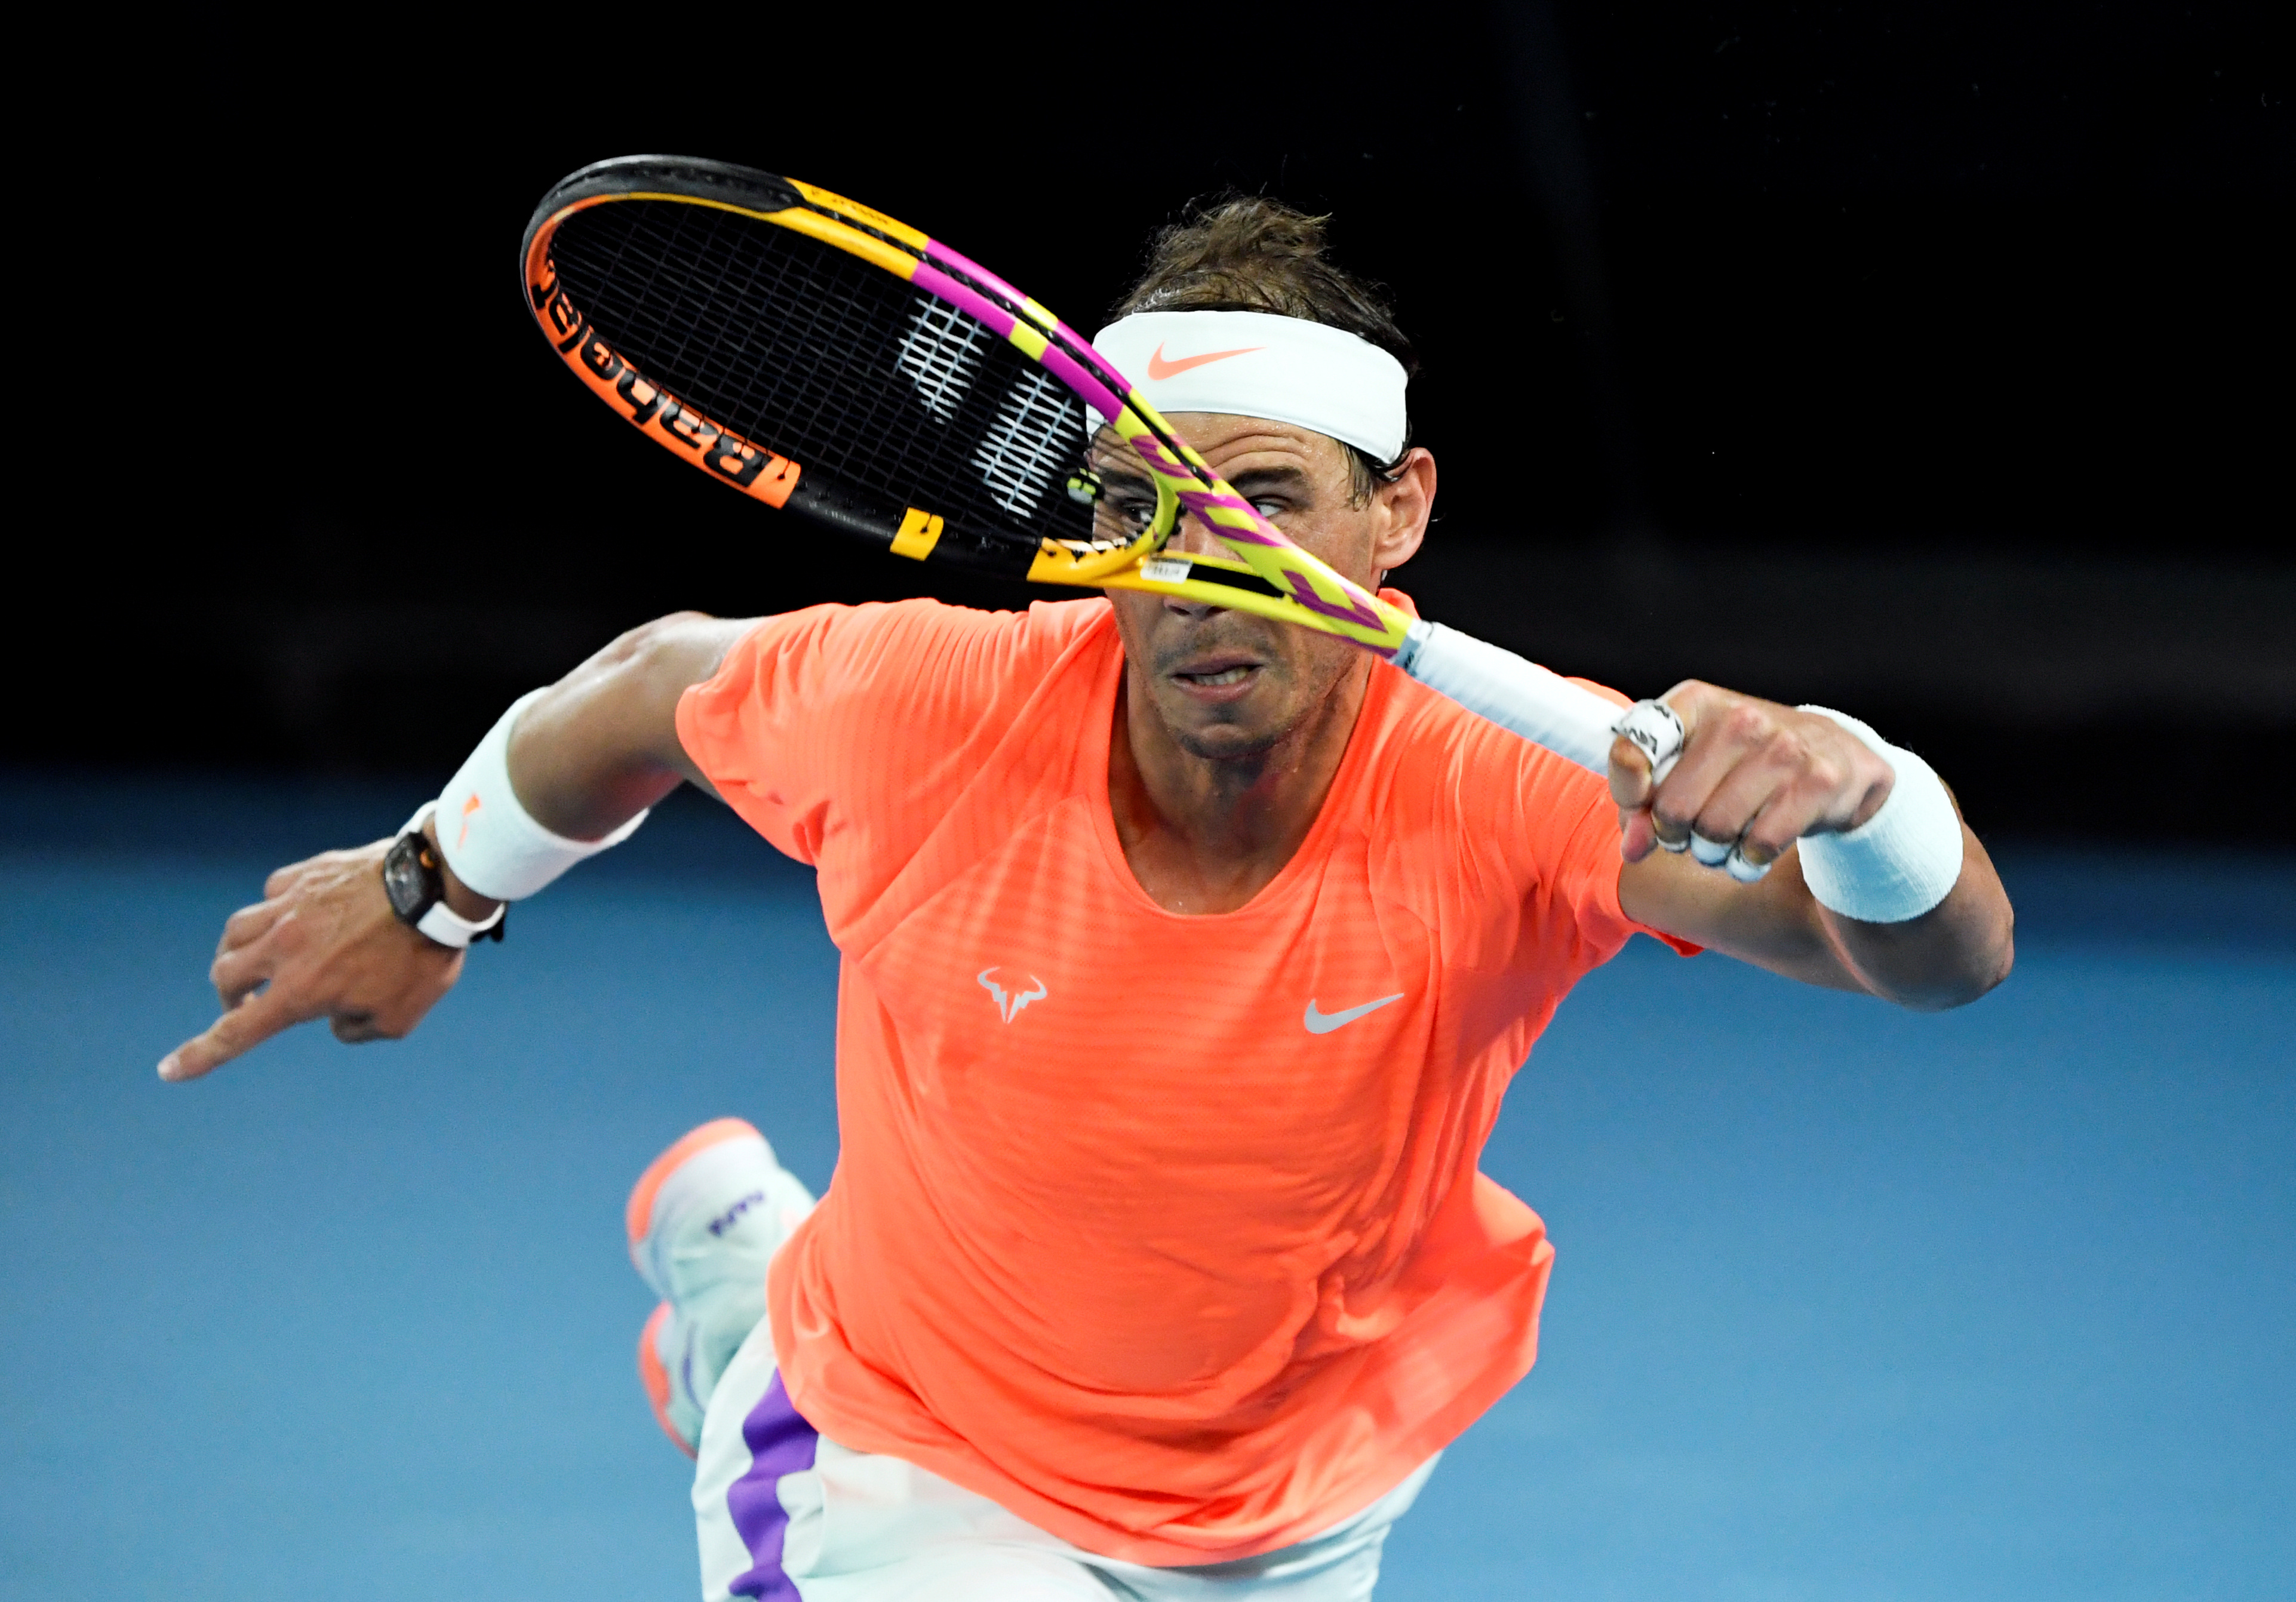 Tennis - Australian Open - Melbourne Park, Melbourne, Australia, February 17, 2021 Spain's Rafael Nadal in action during his quarter final match against Greece's Stefanos Tsitsipas REUTERS/Jaimi Joy